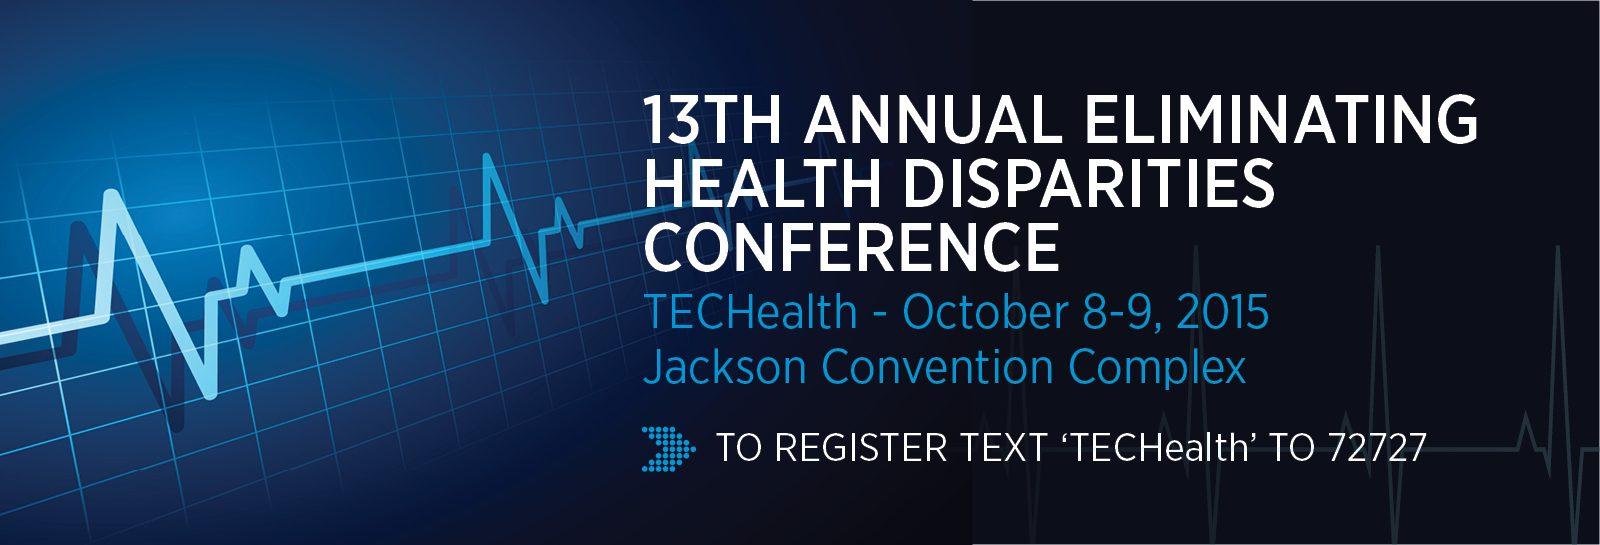 Eliminating Health Disparities Conference slider